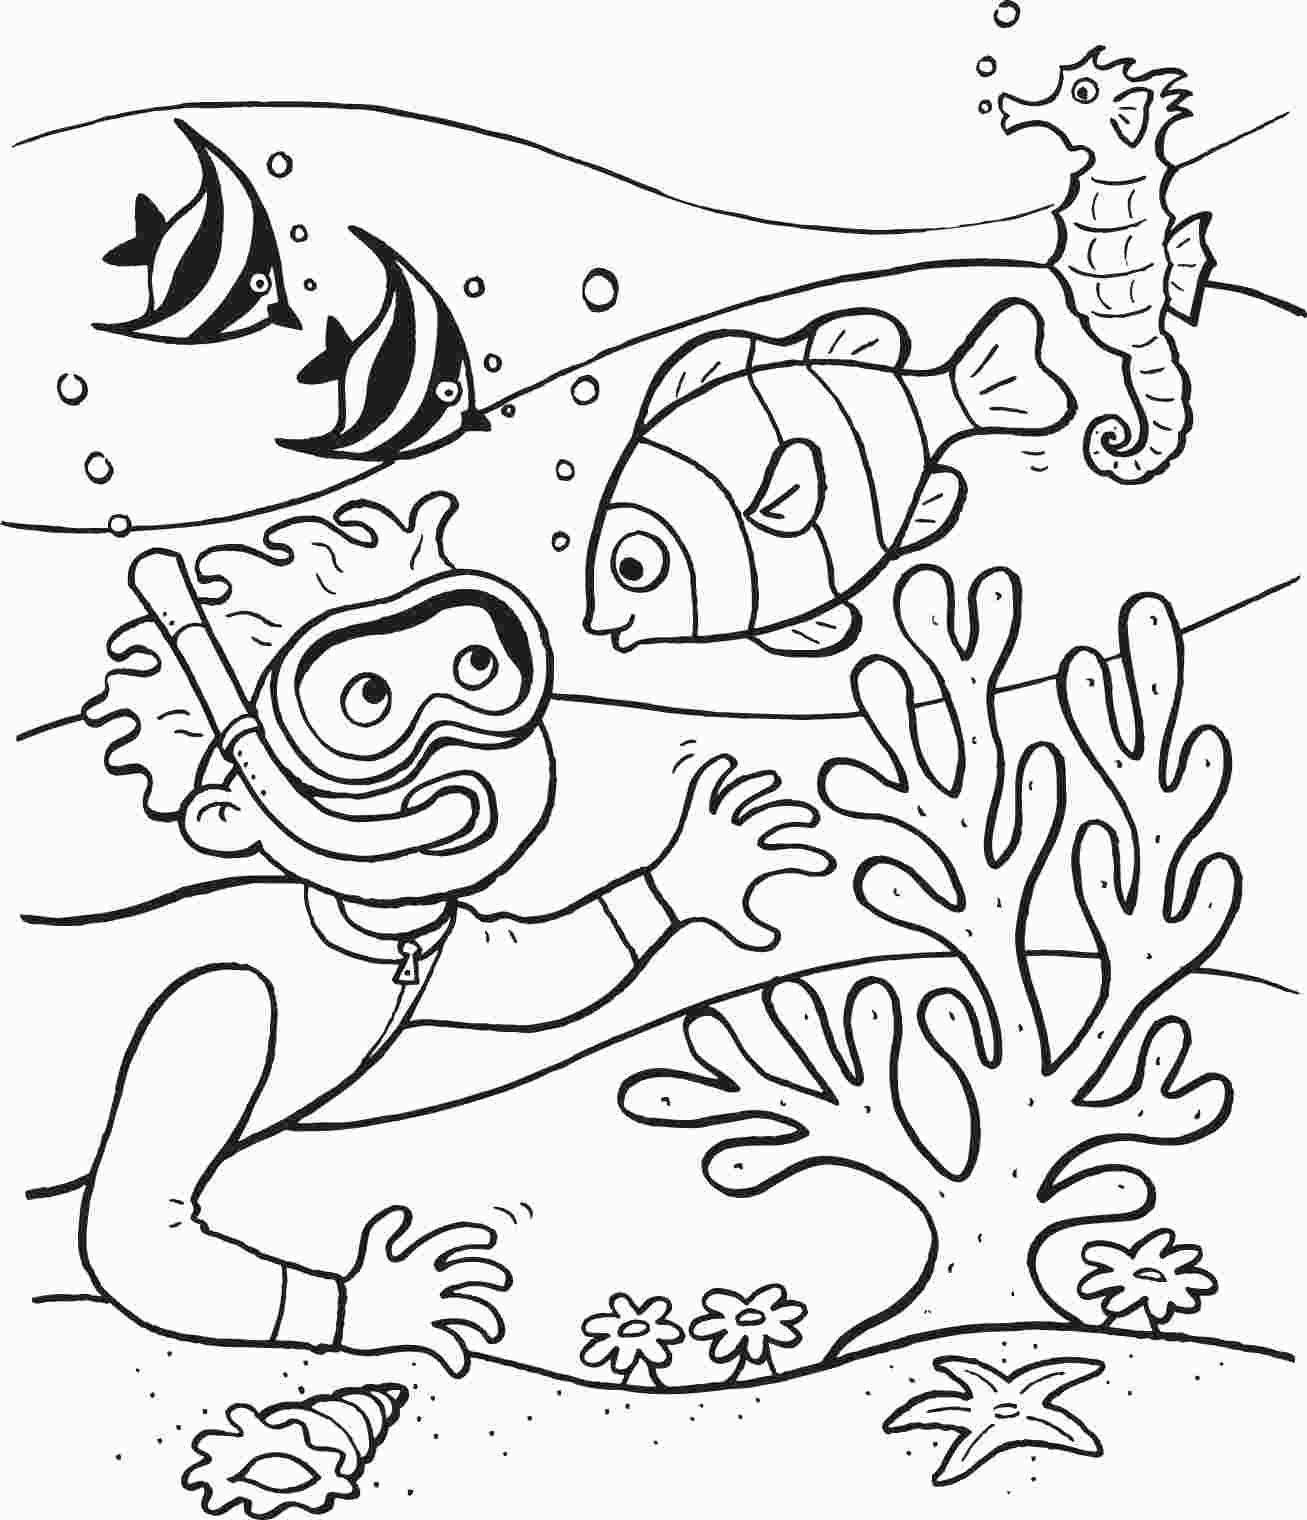 Underwater Coloring Sheets Ocean Coloring Pages Fish Coloring Page Beach Coloring Pages